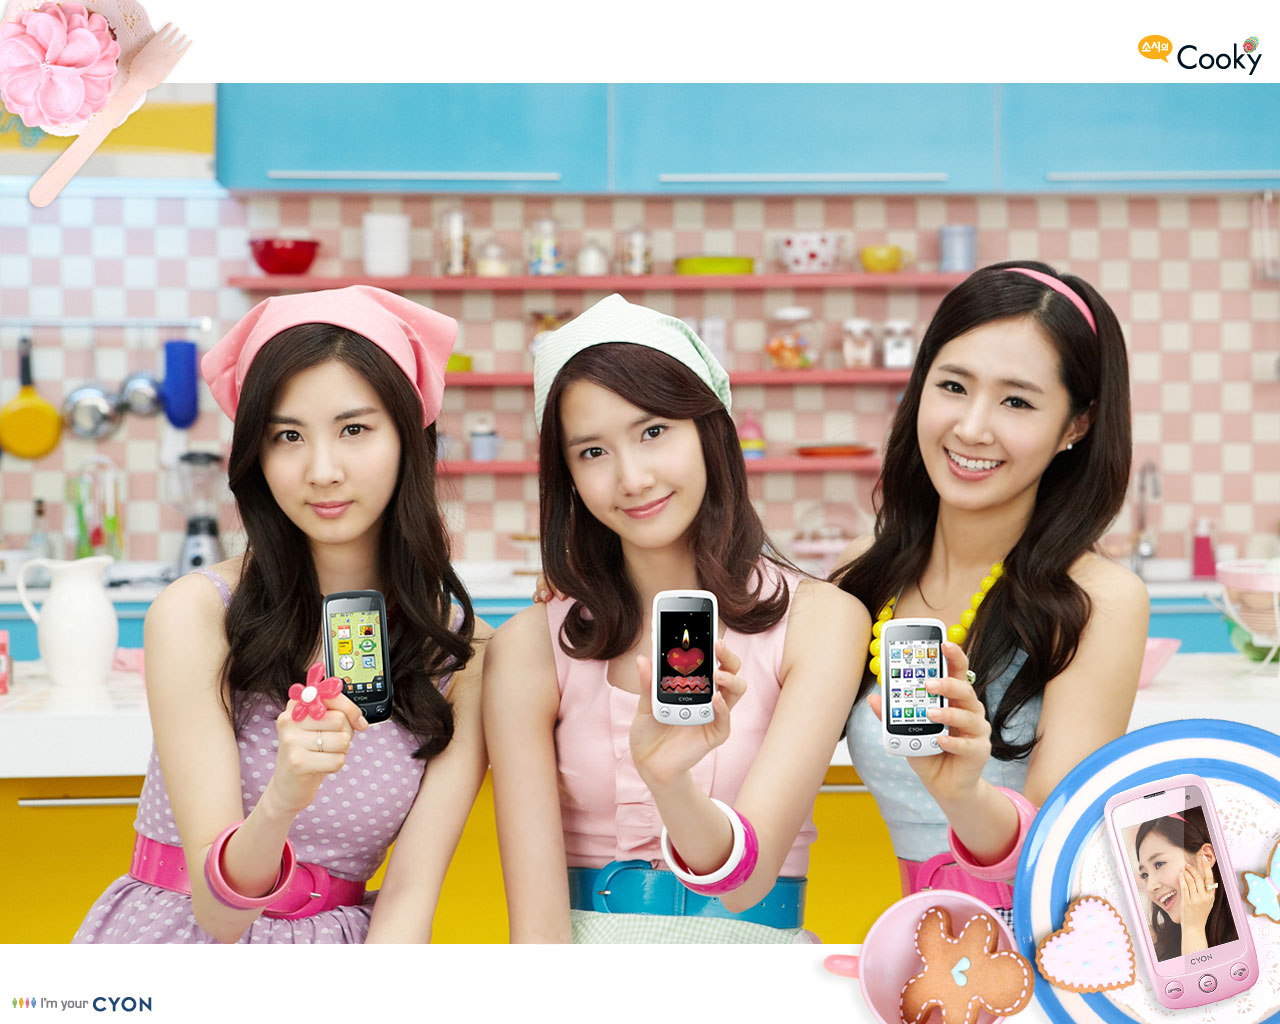 Snsd Lg 3d Tv Wallpaper Lg Cyon Cooky Wallpapers Snsd Pics